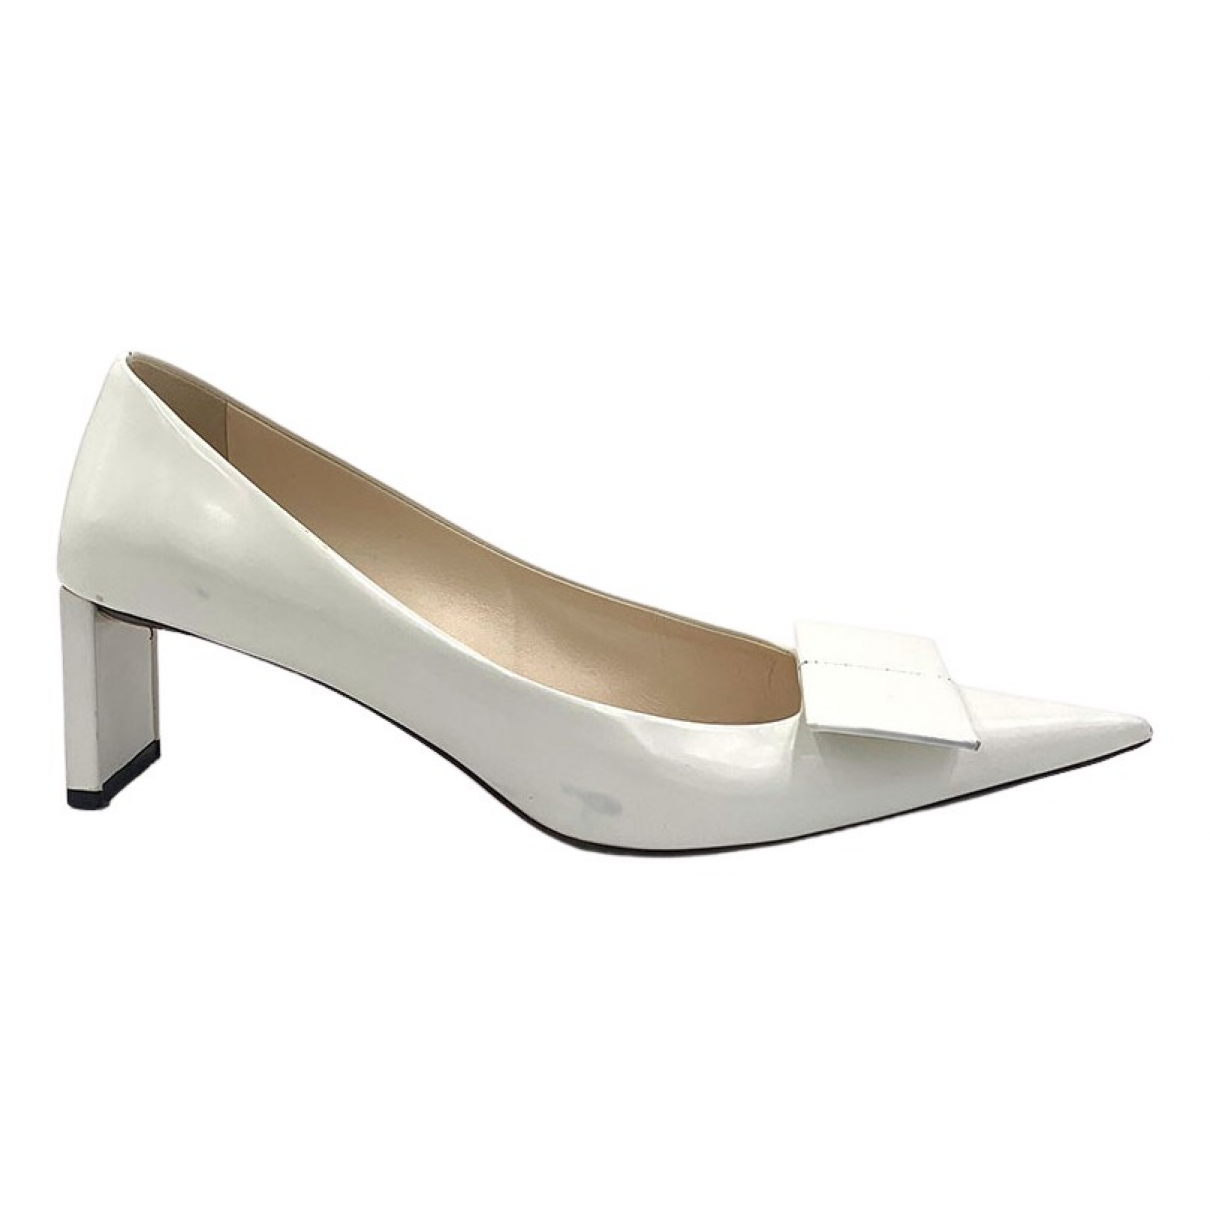 Louis Vuitton N White Leather Heels for Women 38.5 EU